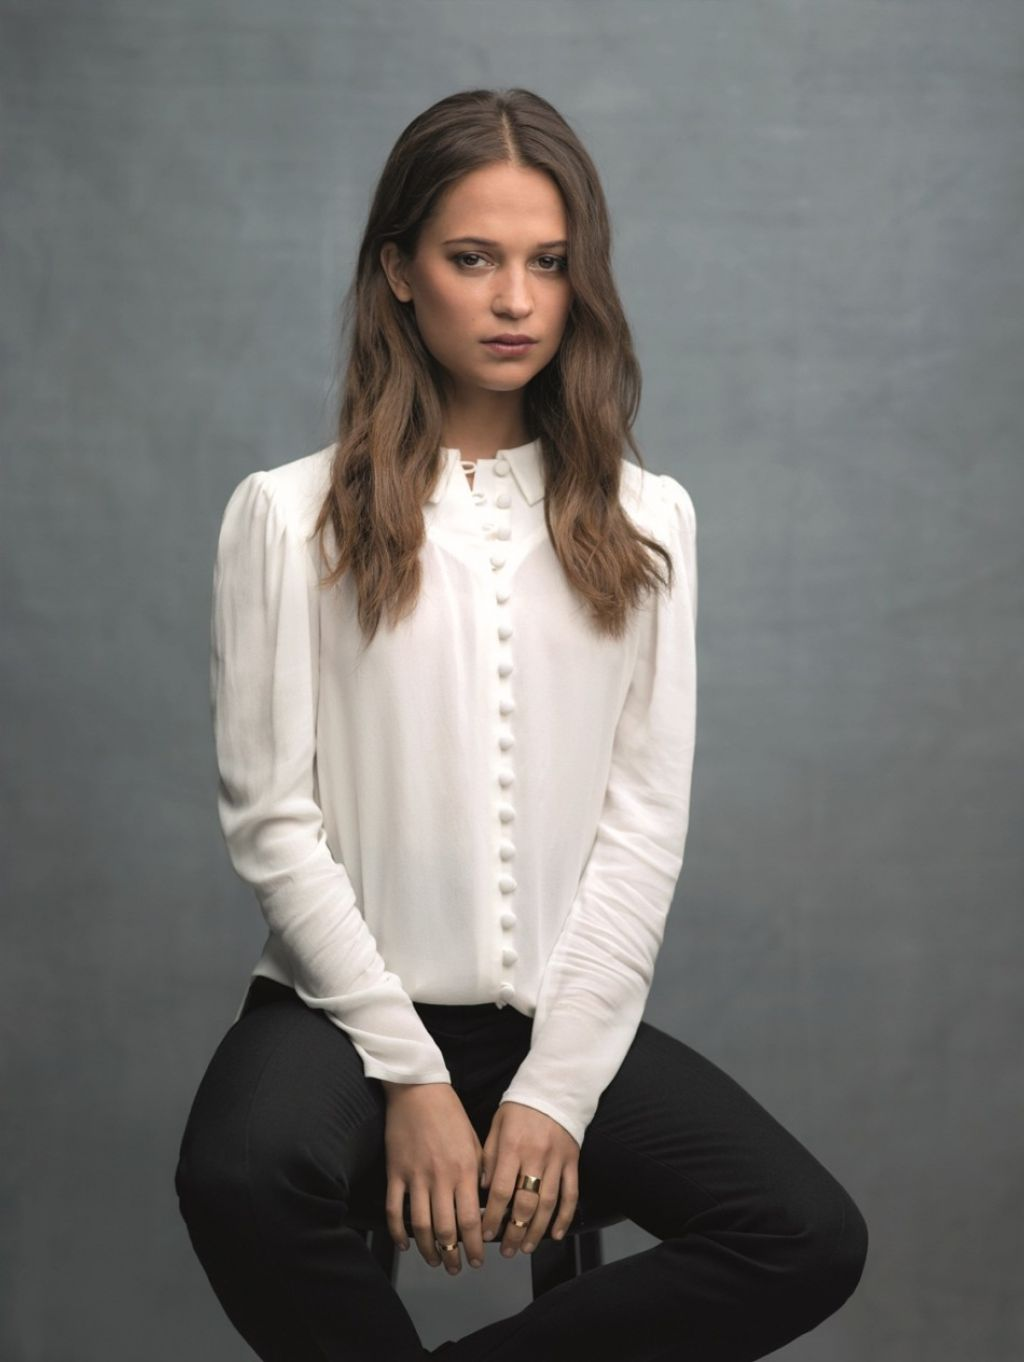 Alicia Vikander Bourne